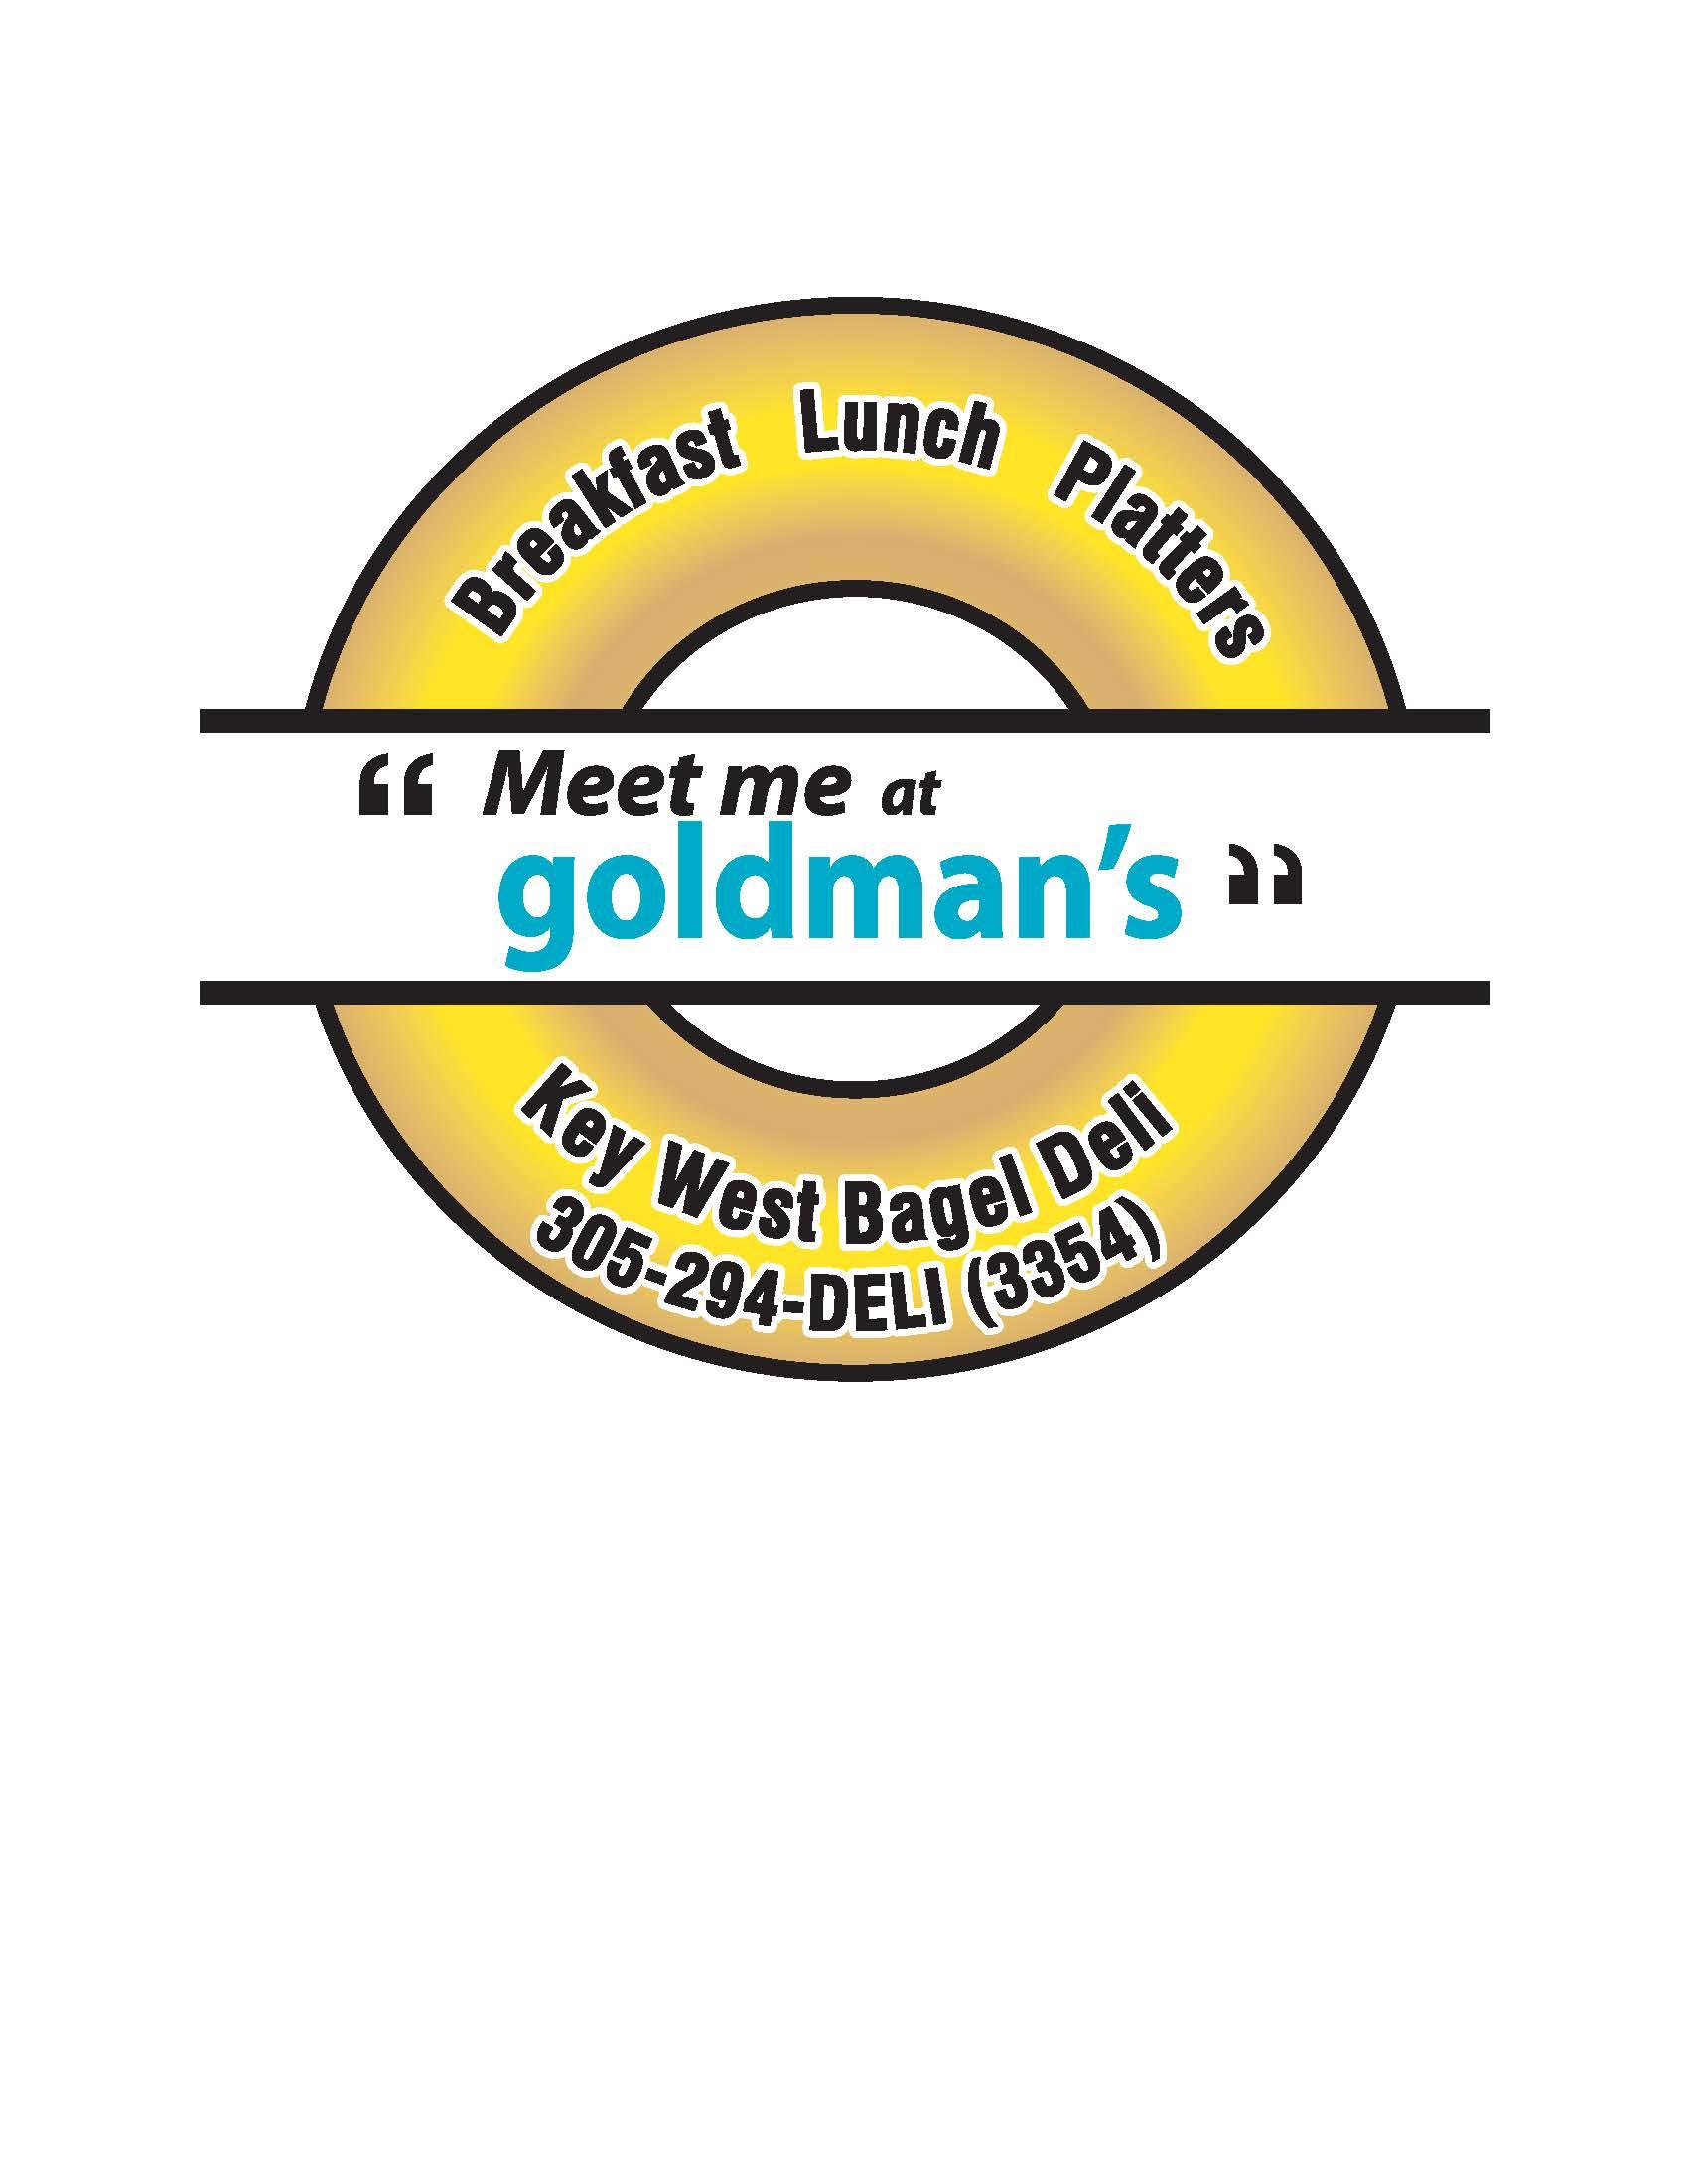 Goldman's Bagel Deli